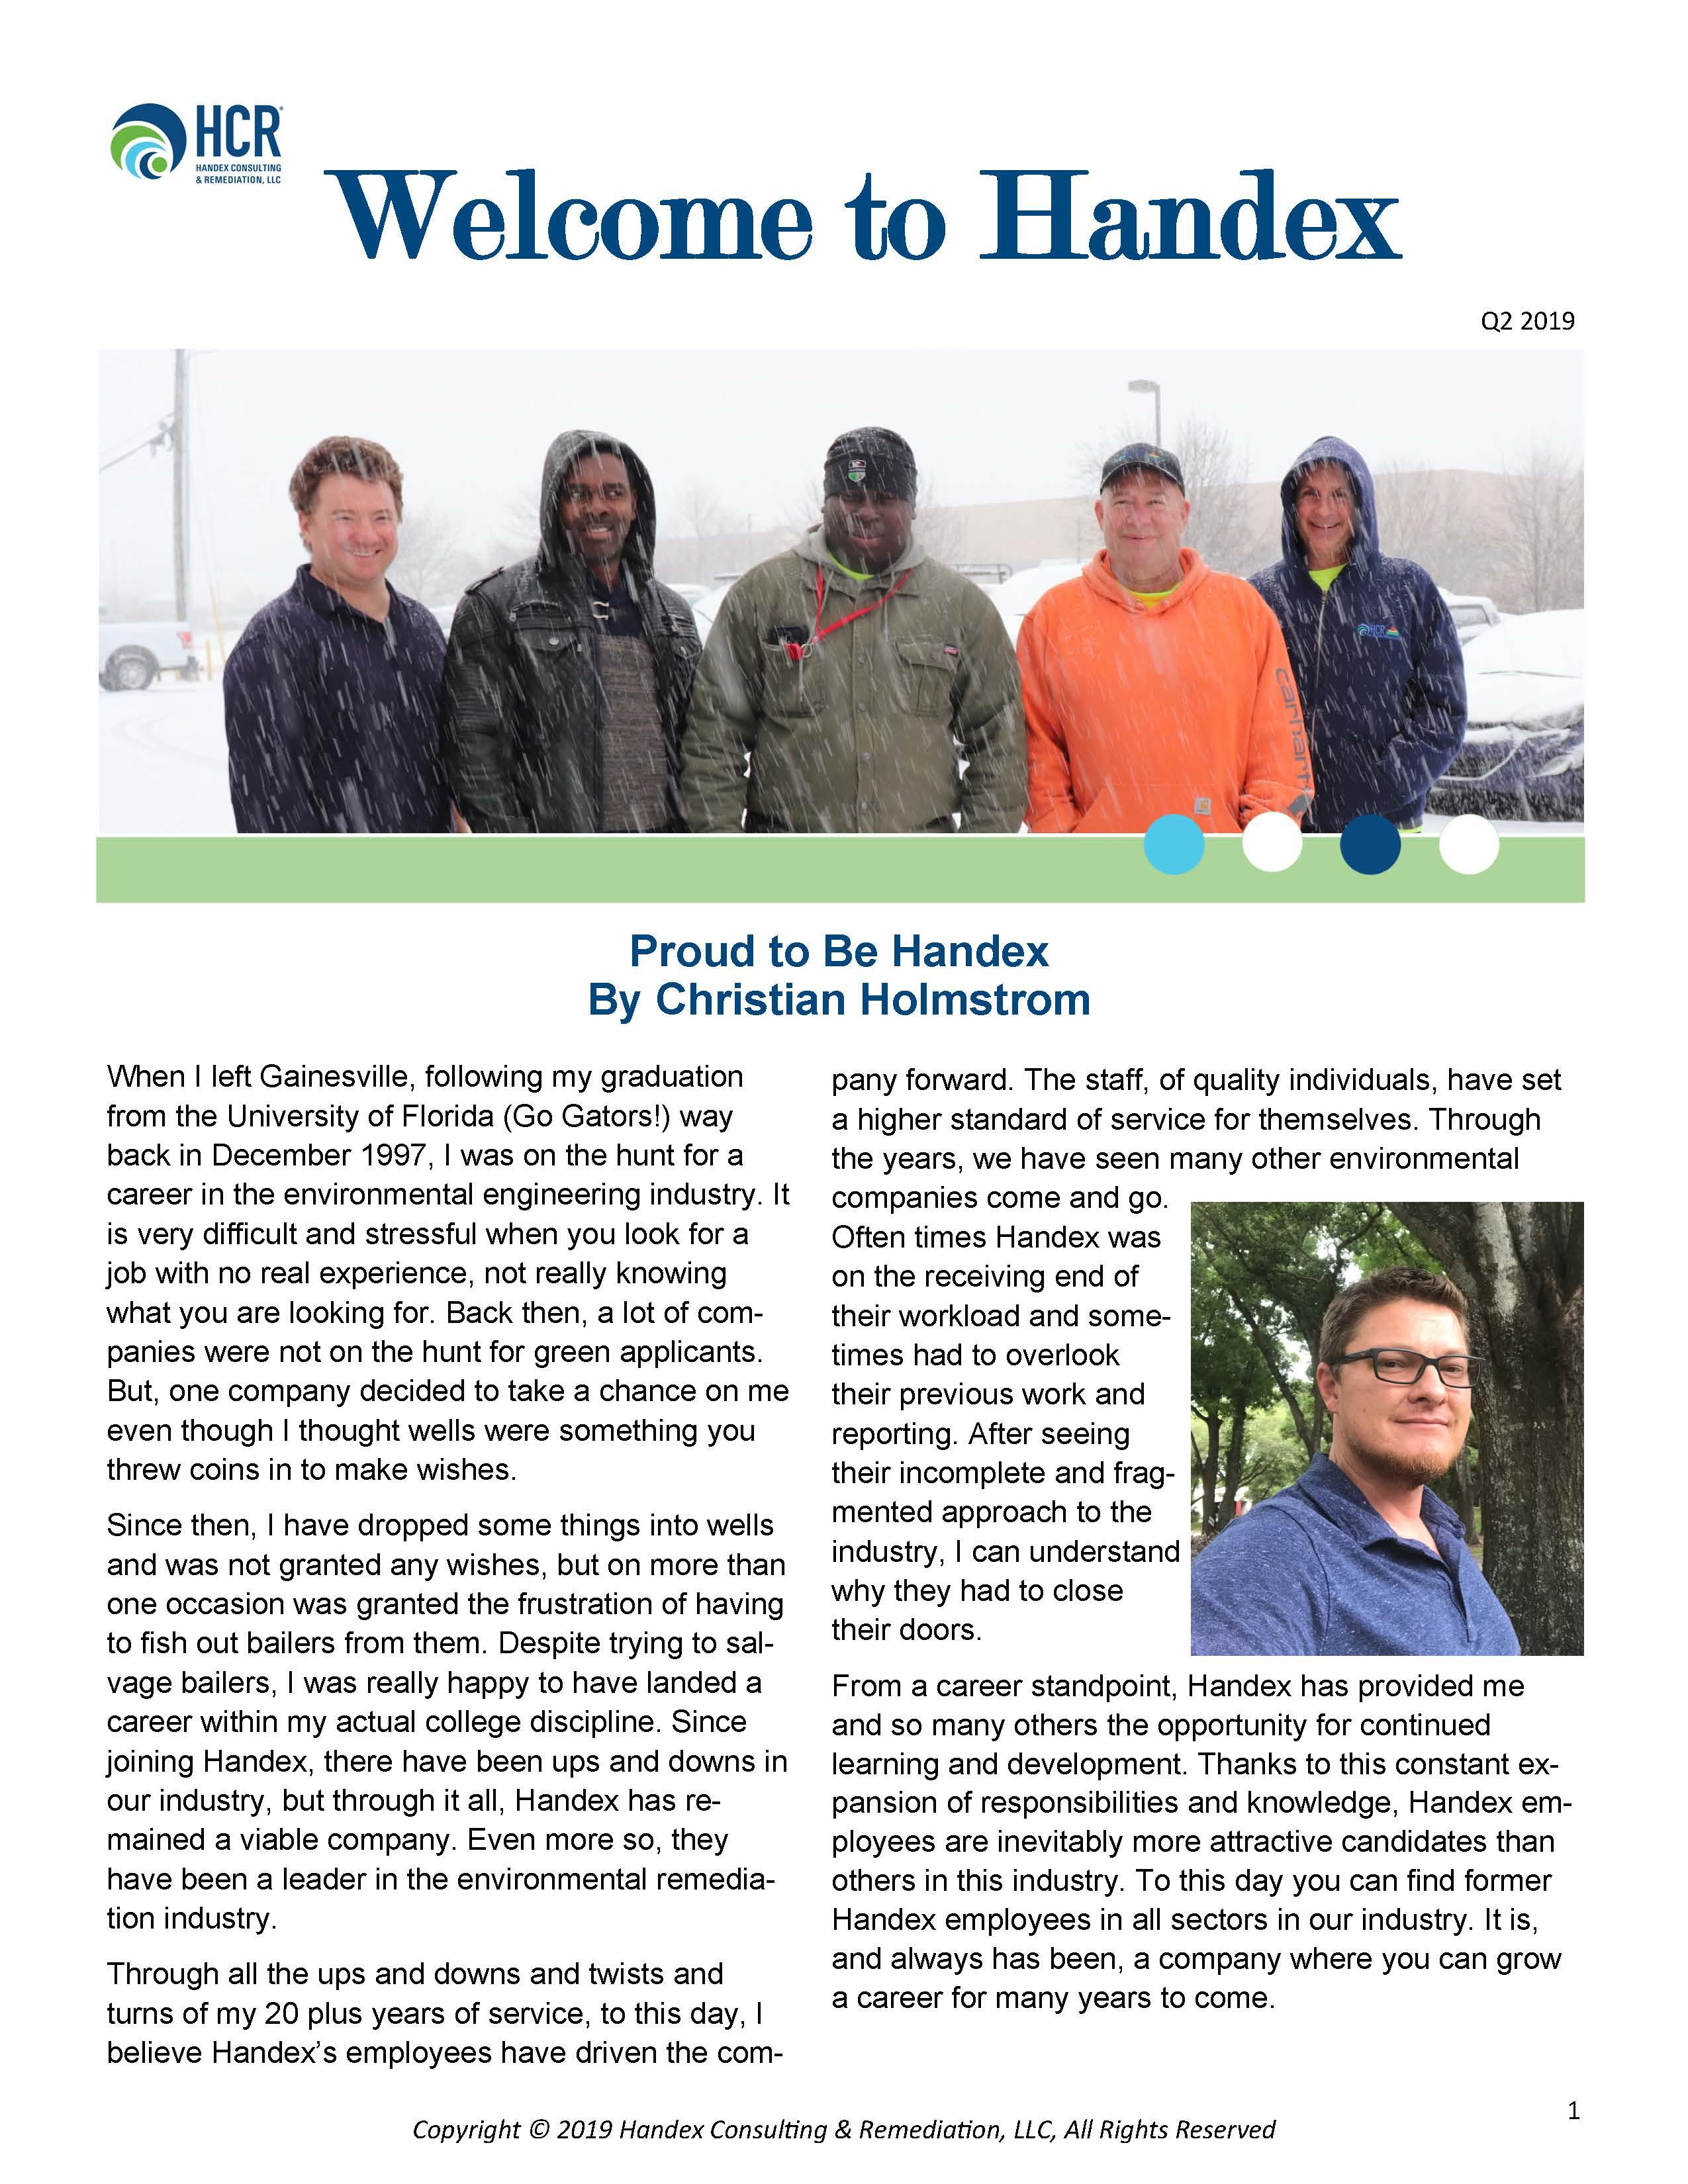 Handex Quarterly Newsletter Q2 2019